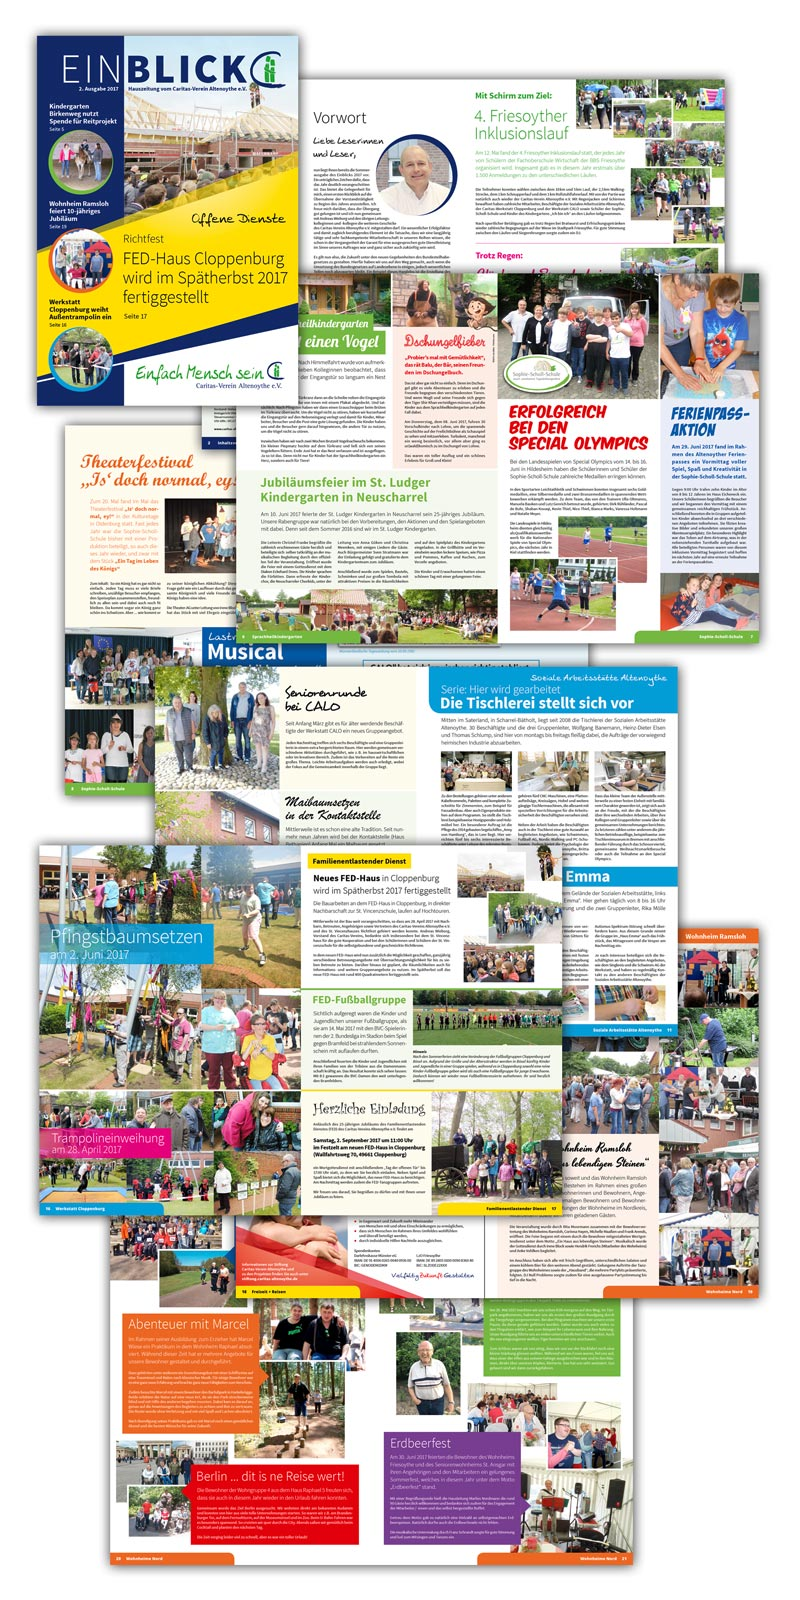 Design Caritas Altenoythe Einblick Sommer Magazin 2017